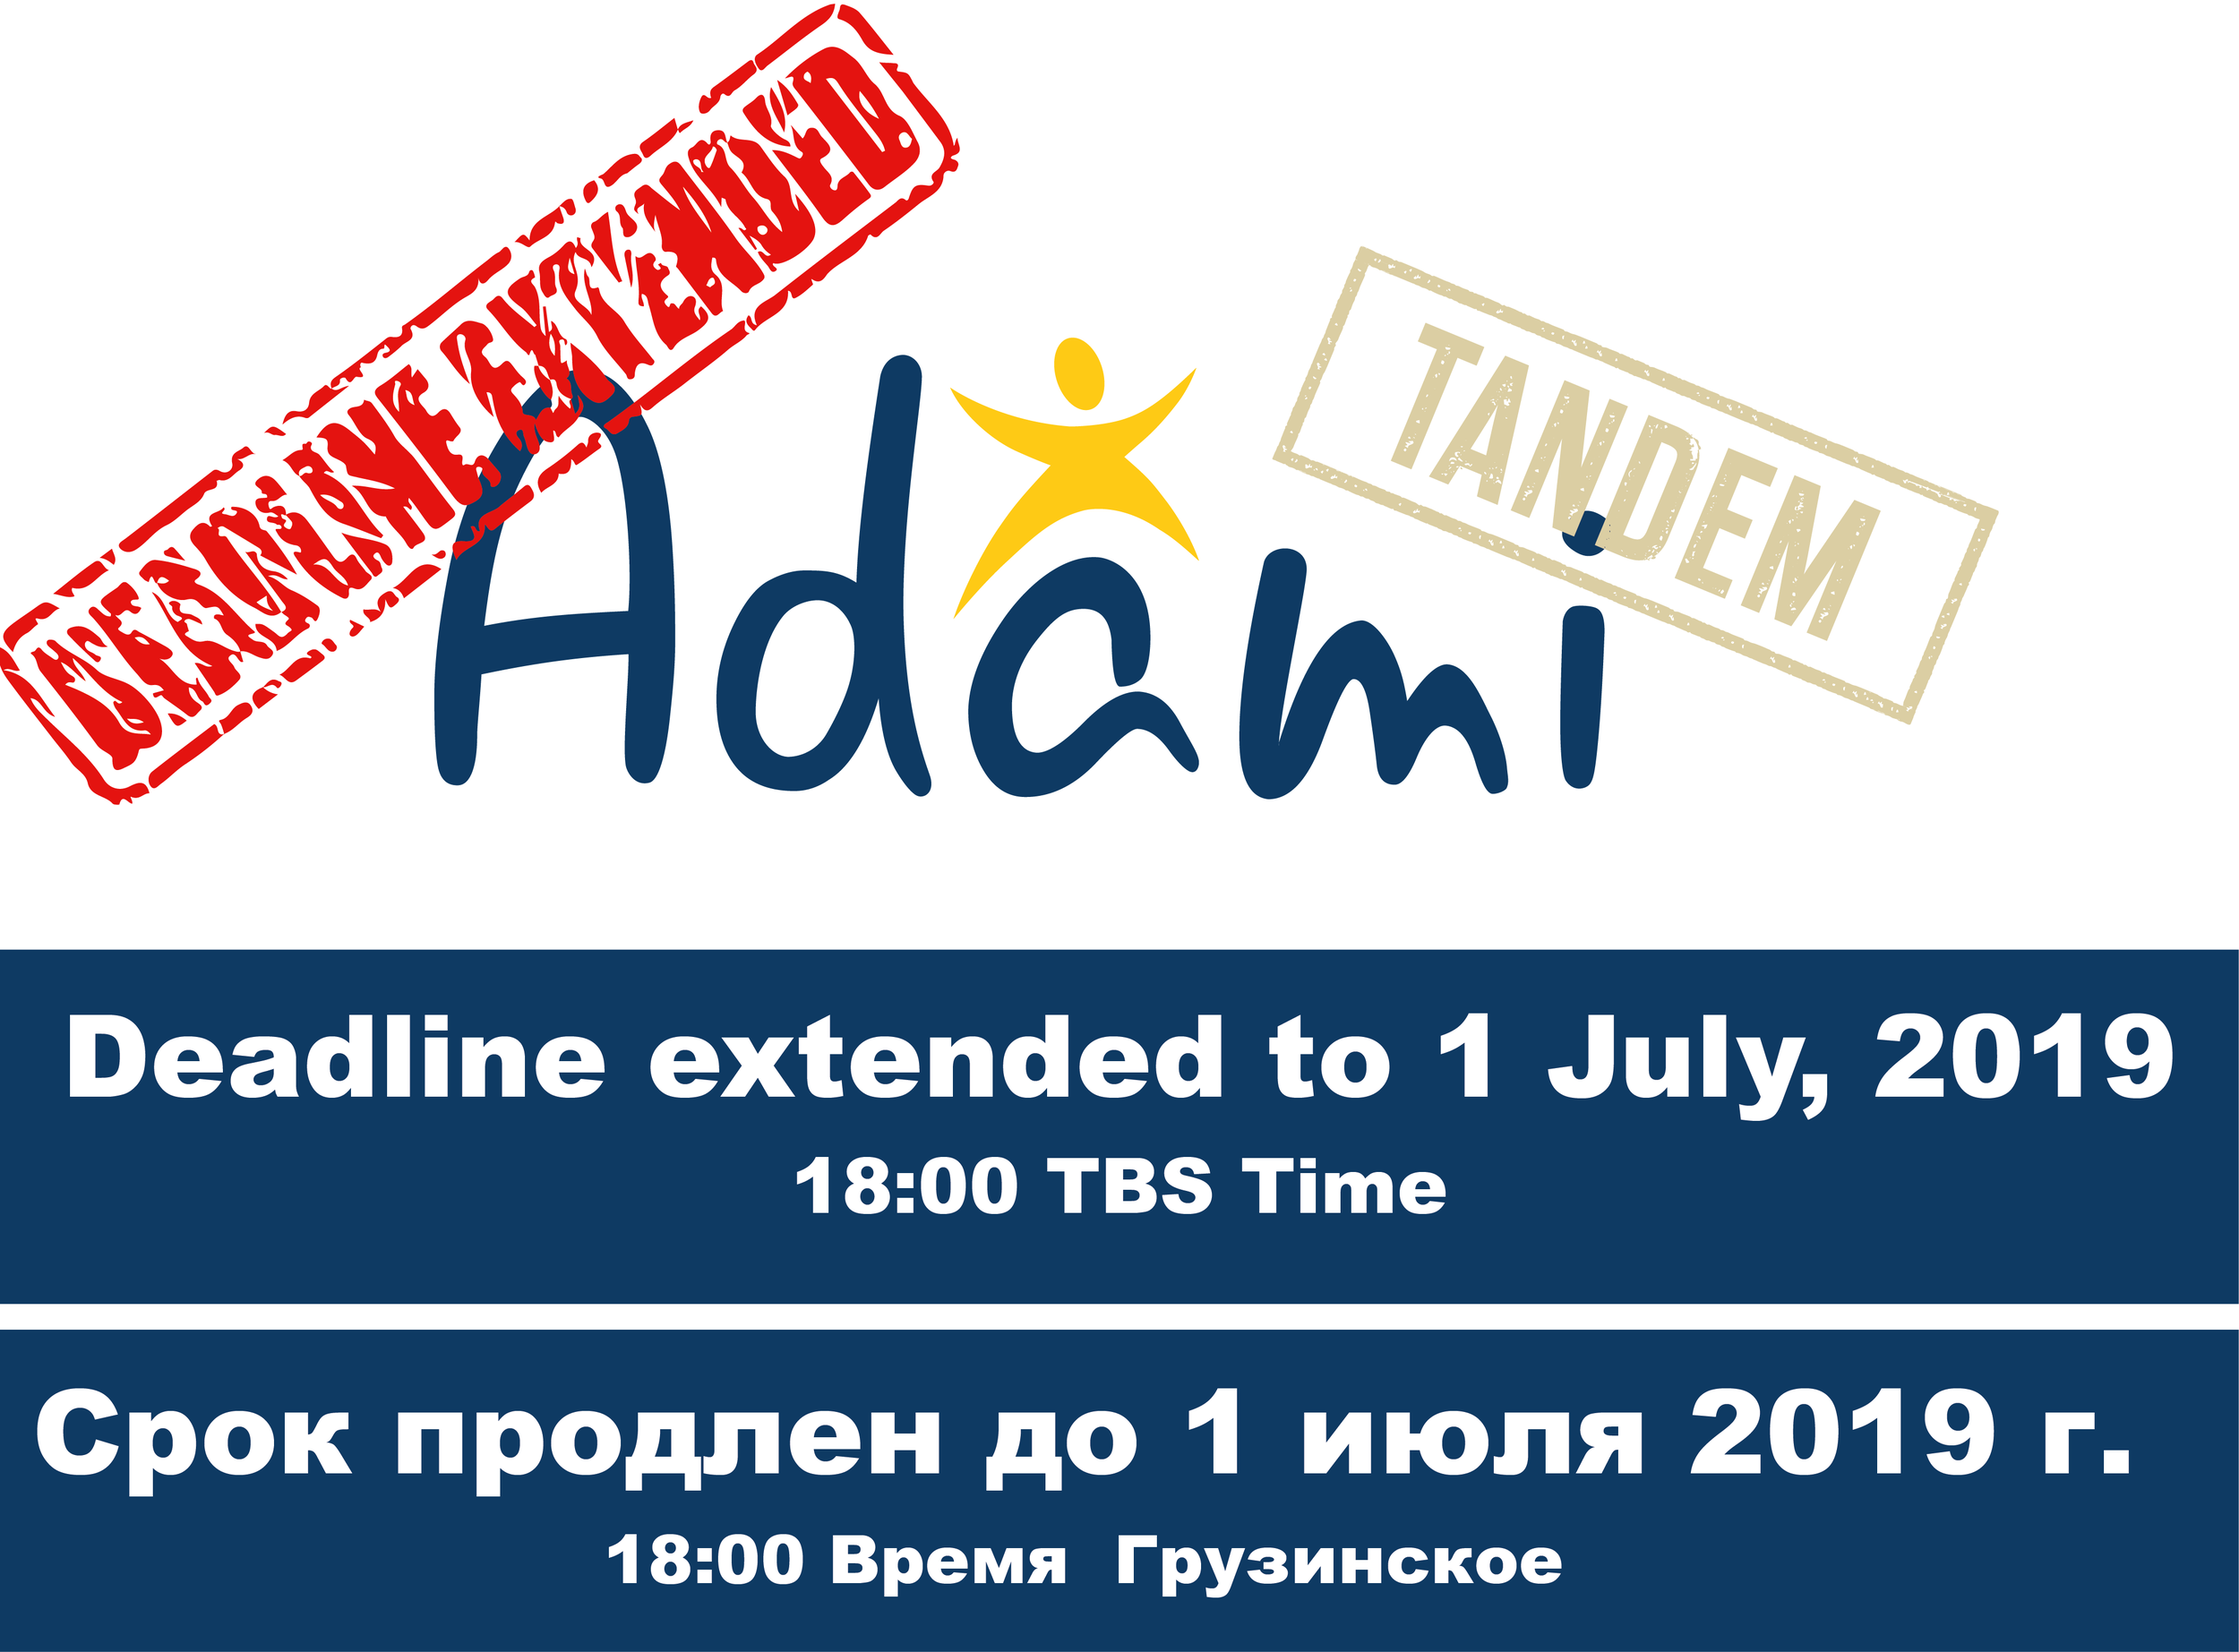 Apply here:  https://www.adamimediaprize.eu/adami-tandem